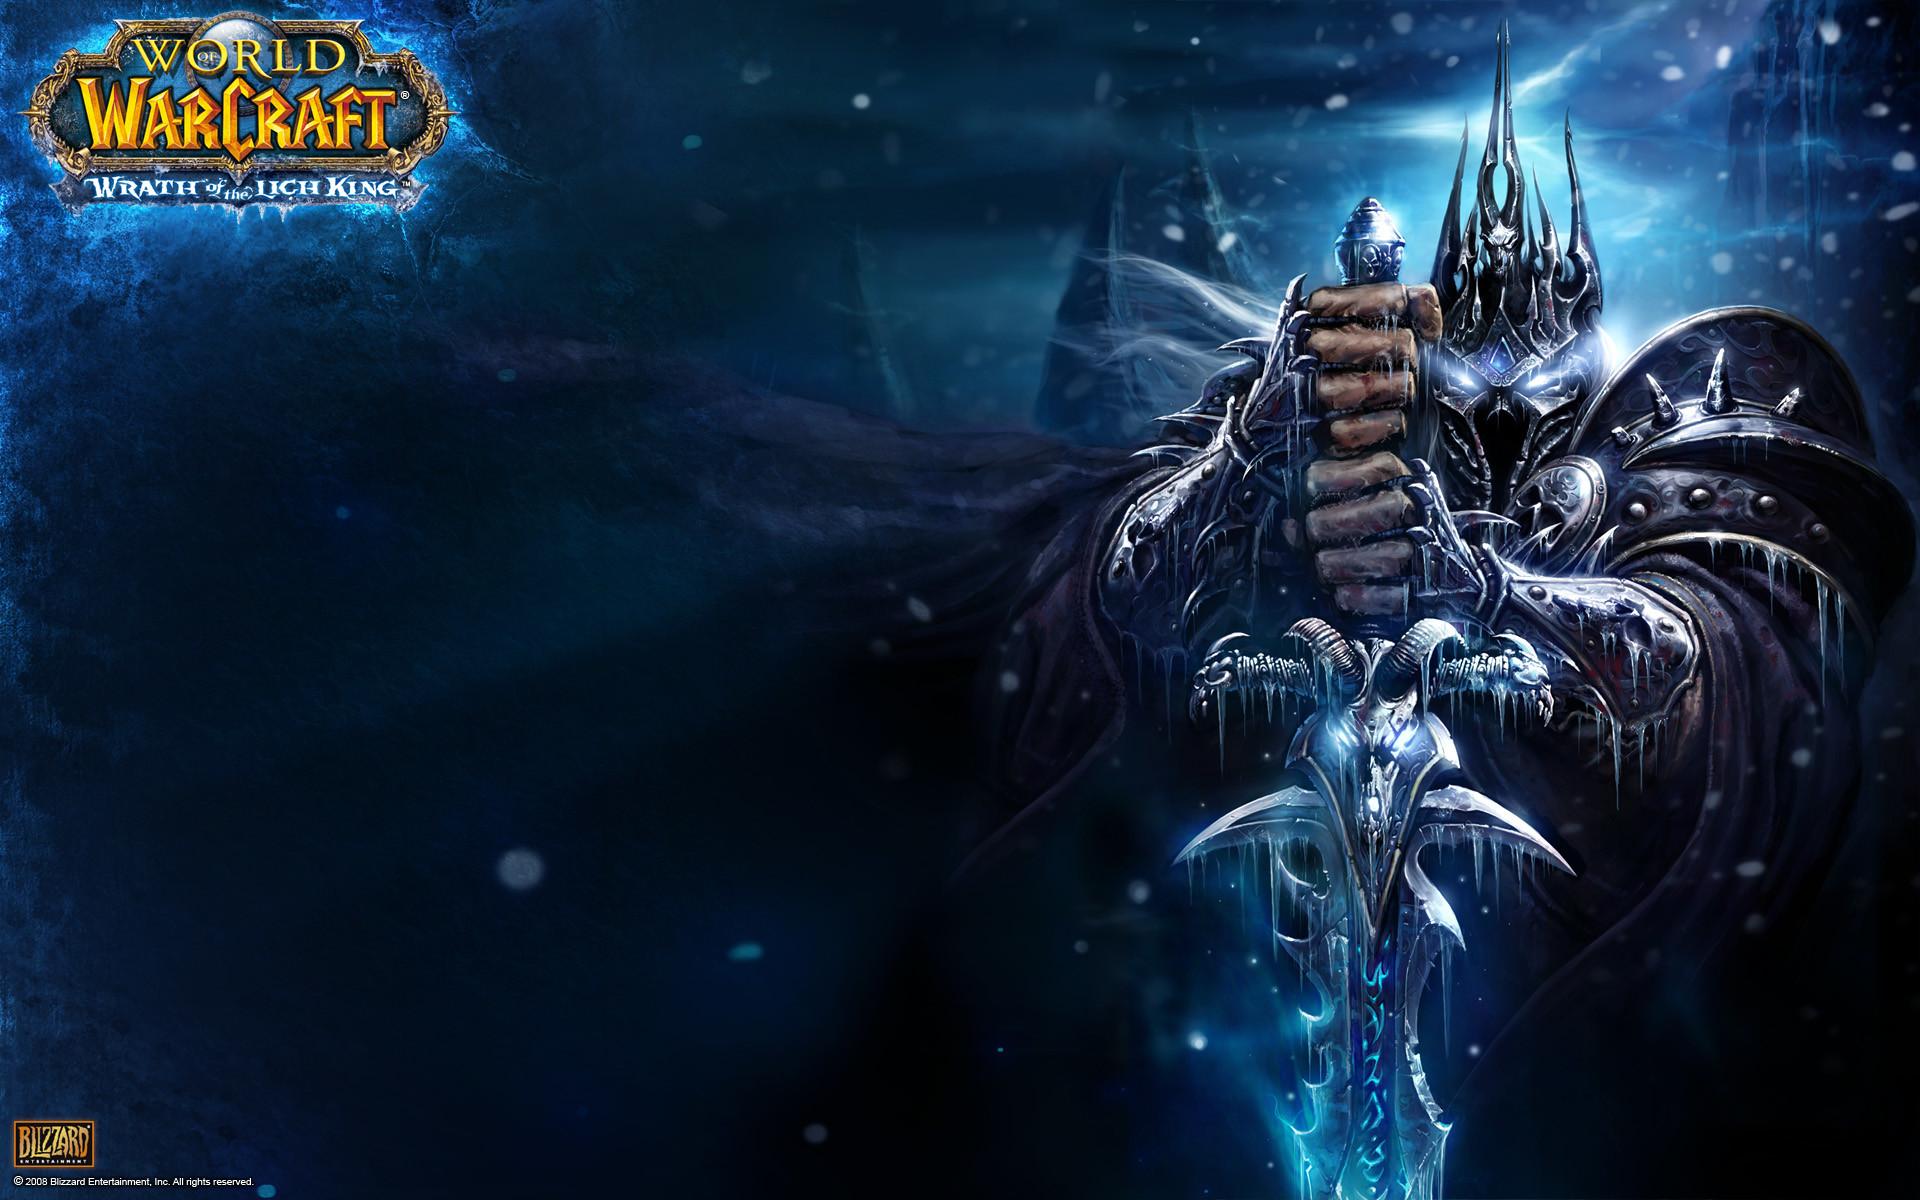 World of Warcraft Death Knight